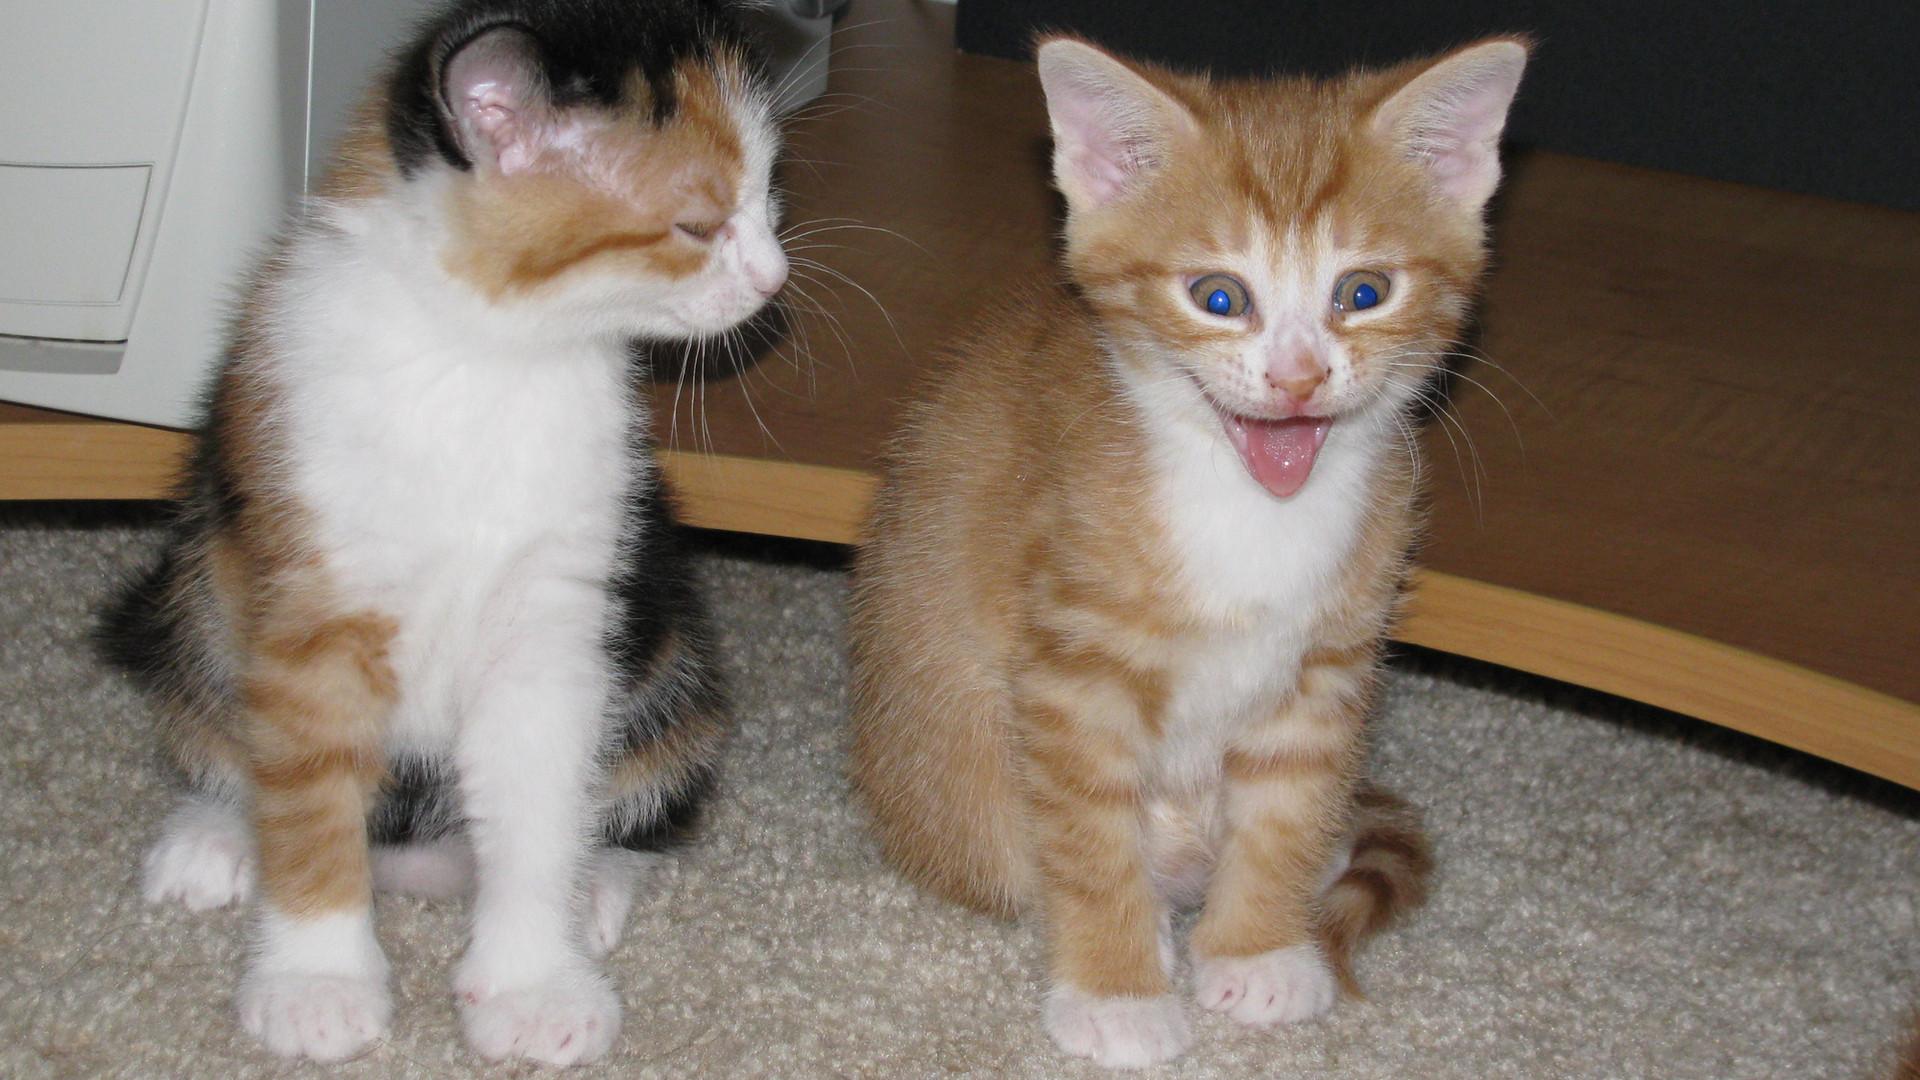 Kitten good expressions.JPG